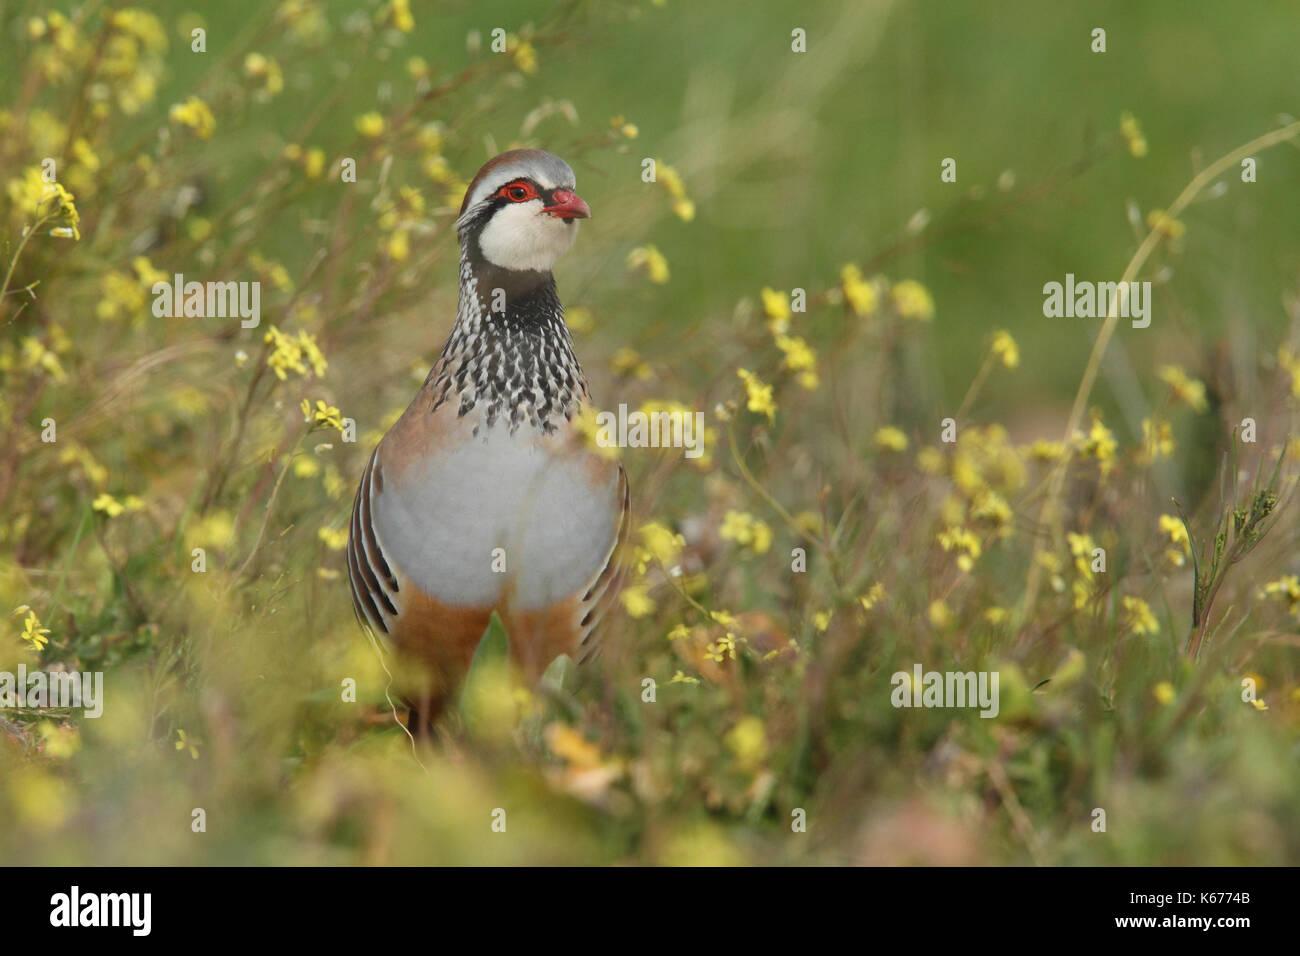 red legged partridge - Stock Image